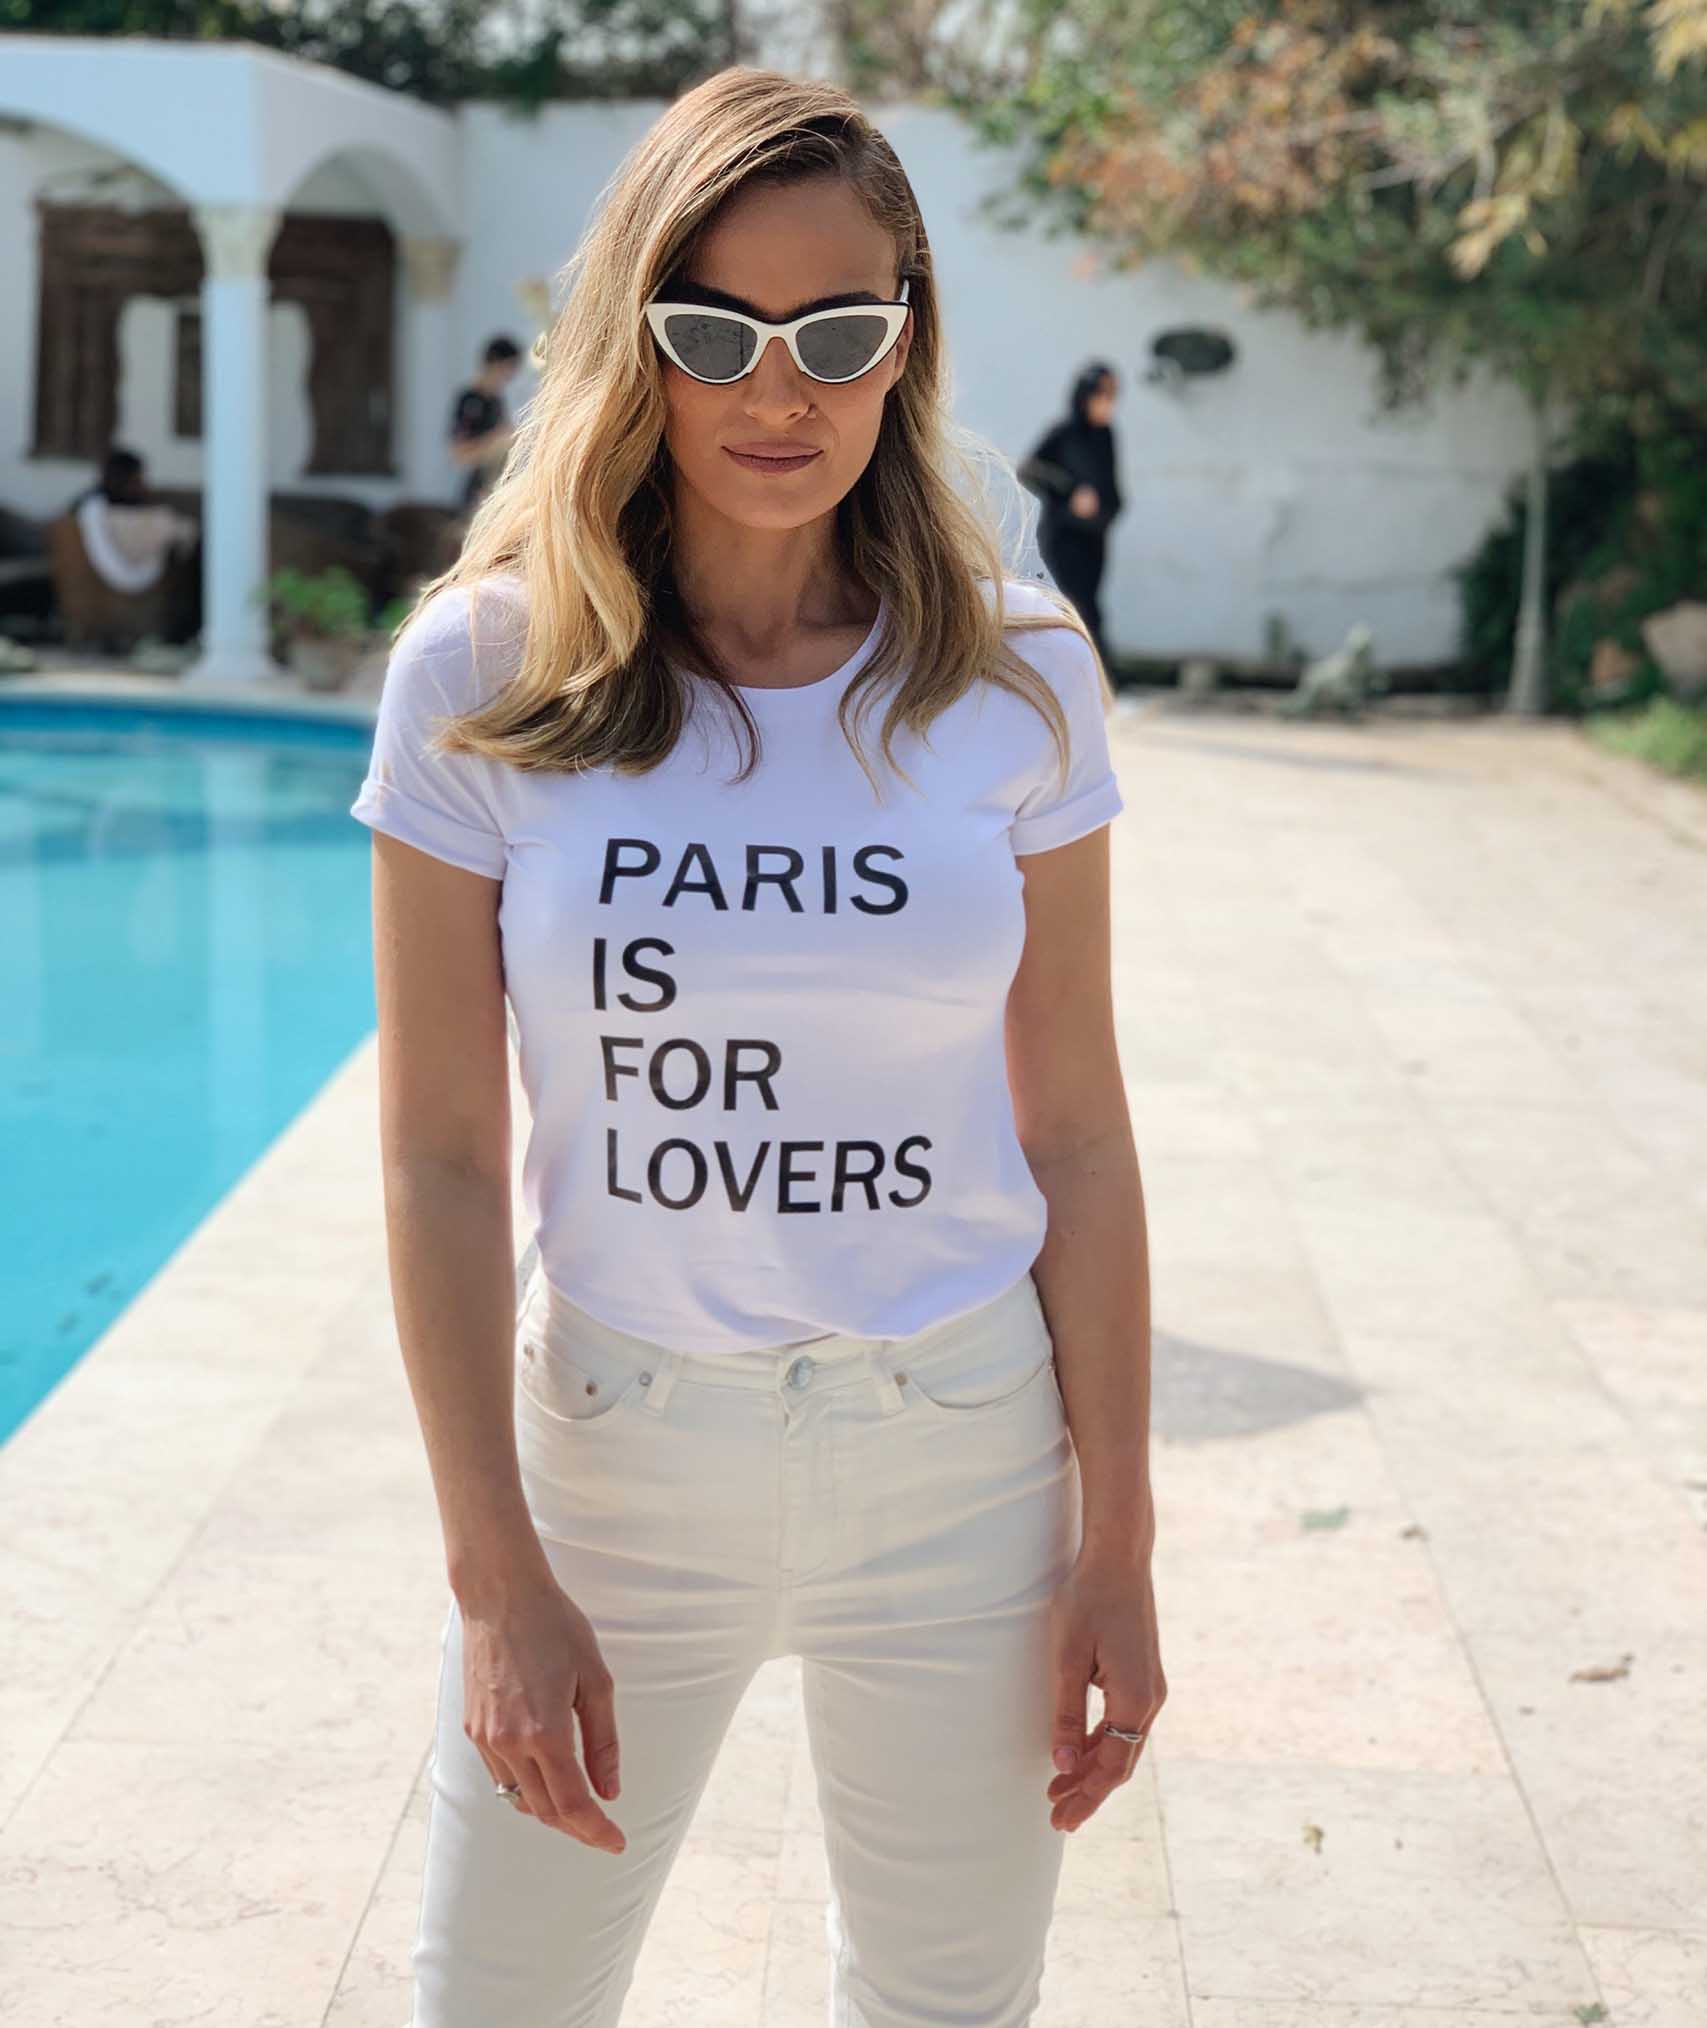 ולנטיין דיי 2020, אילנית לוי עם טי שירטס וולנטיין גולברי קרדיט צילום שקד בוארון, מגזין אופנה